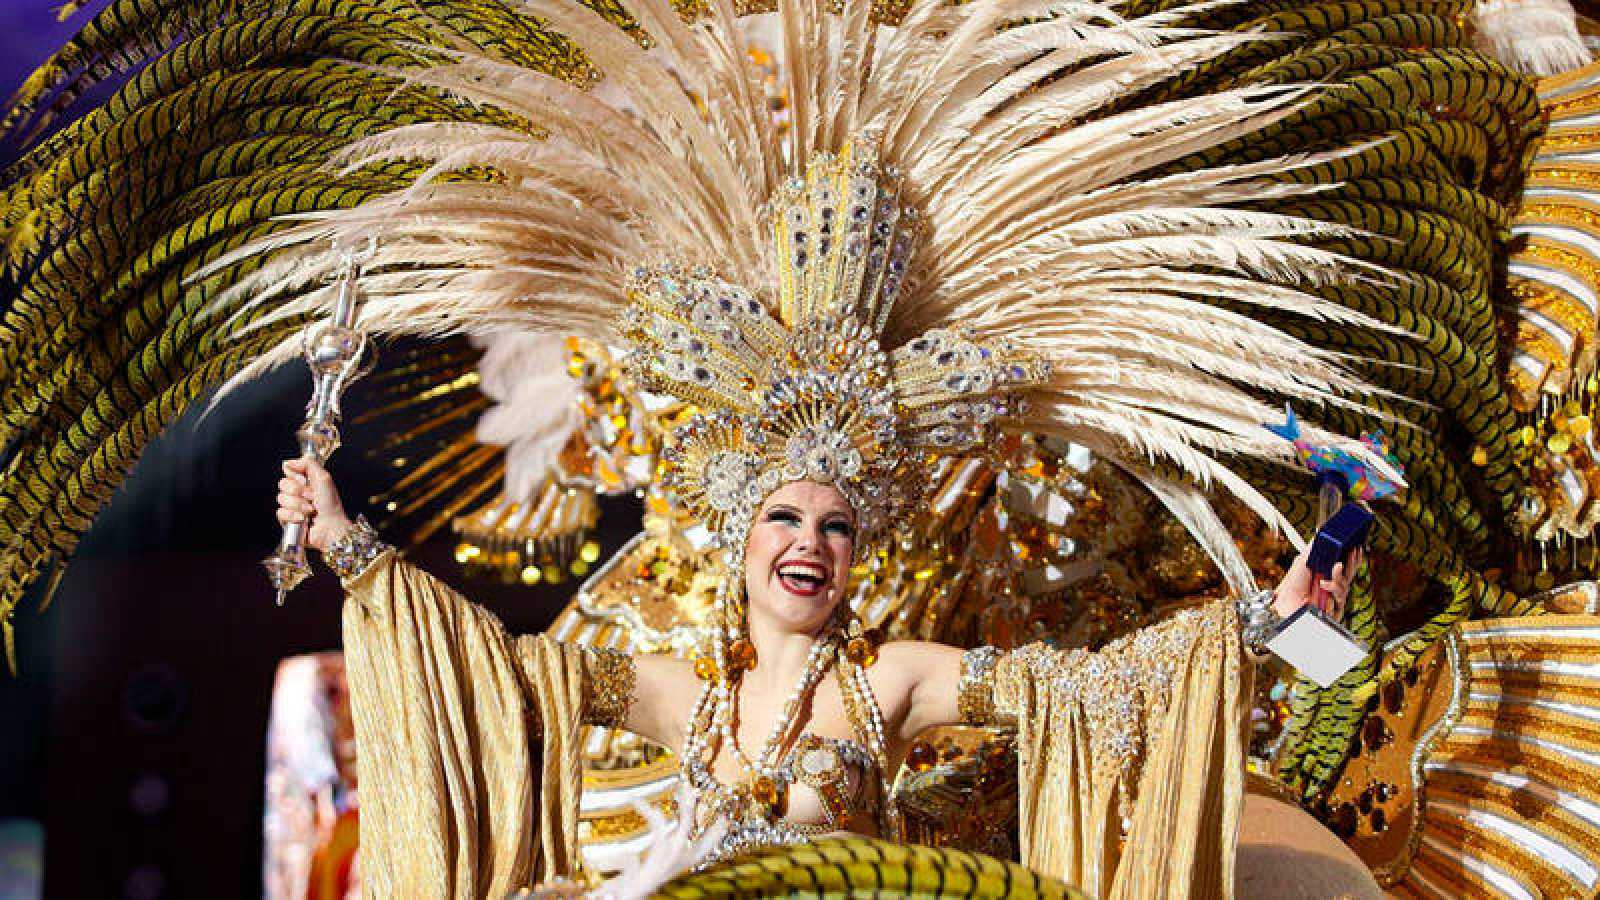 Reina del Carnaval de Santa Cruz de Tenerife 2016